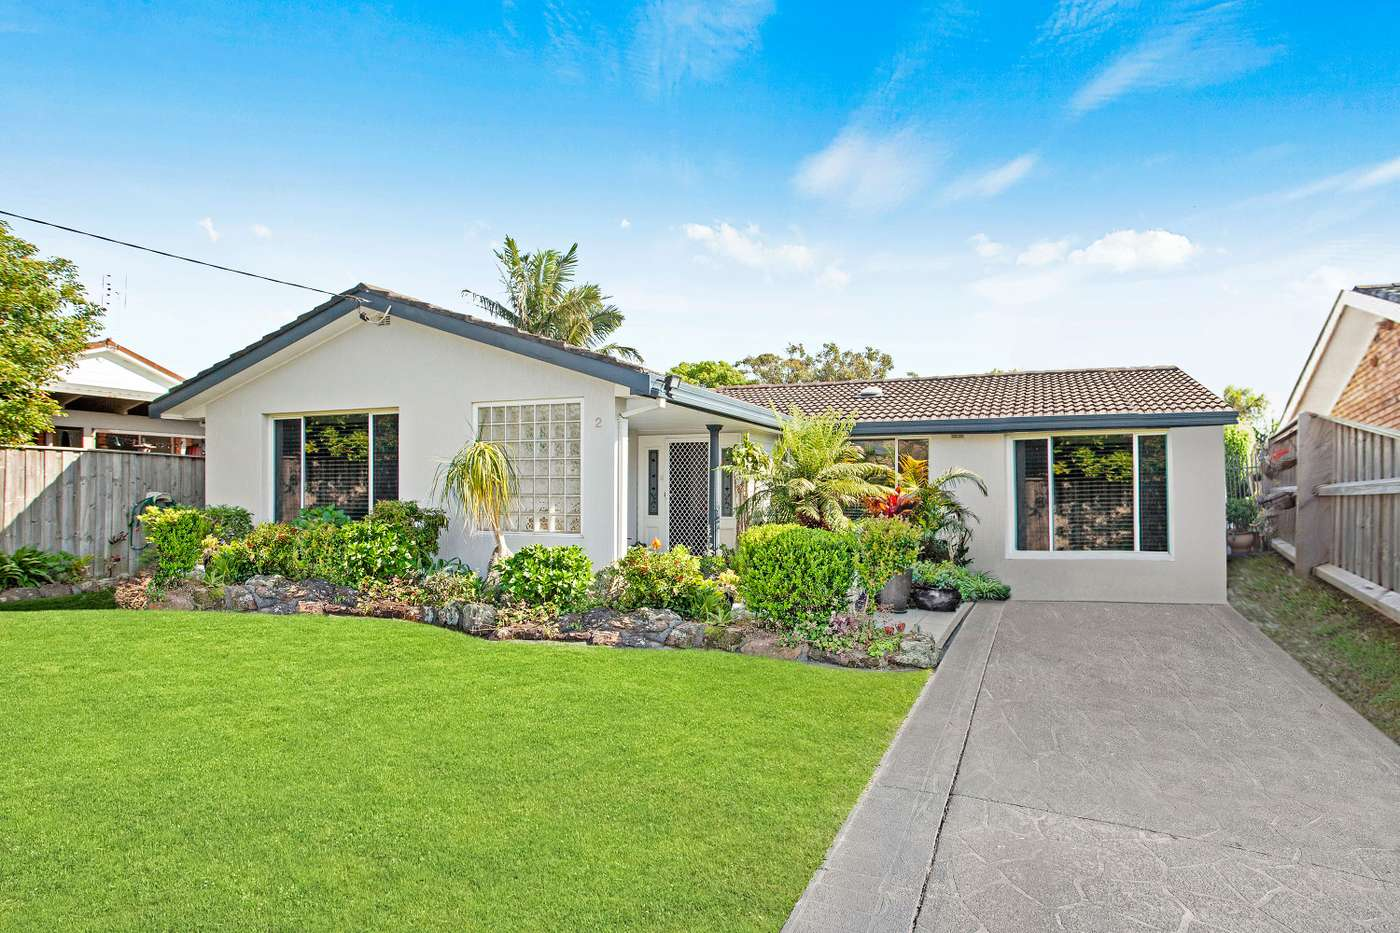 Main view of Homely house listing, 2 Malana Avenue, Bateau Bay, NSW 2261